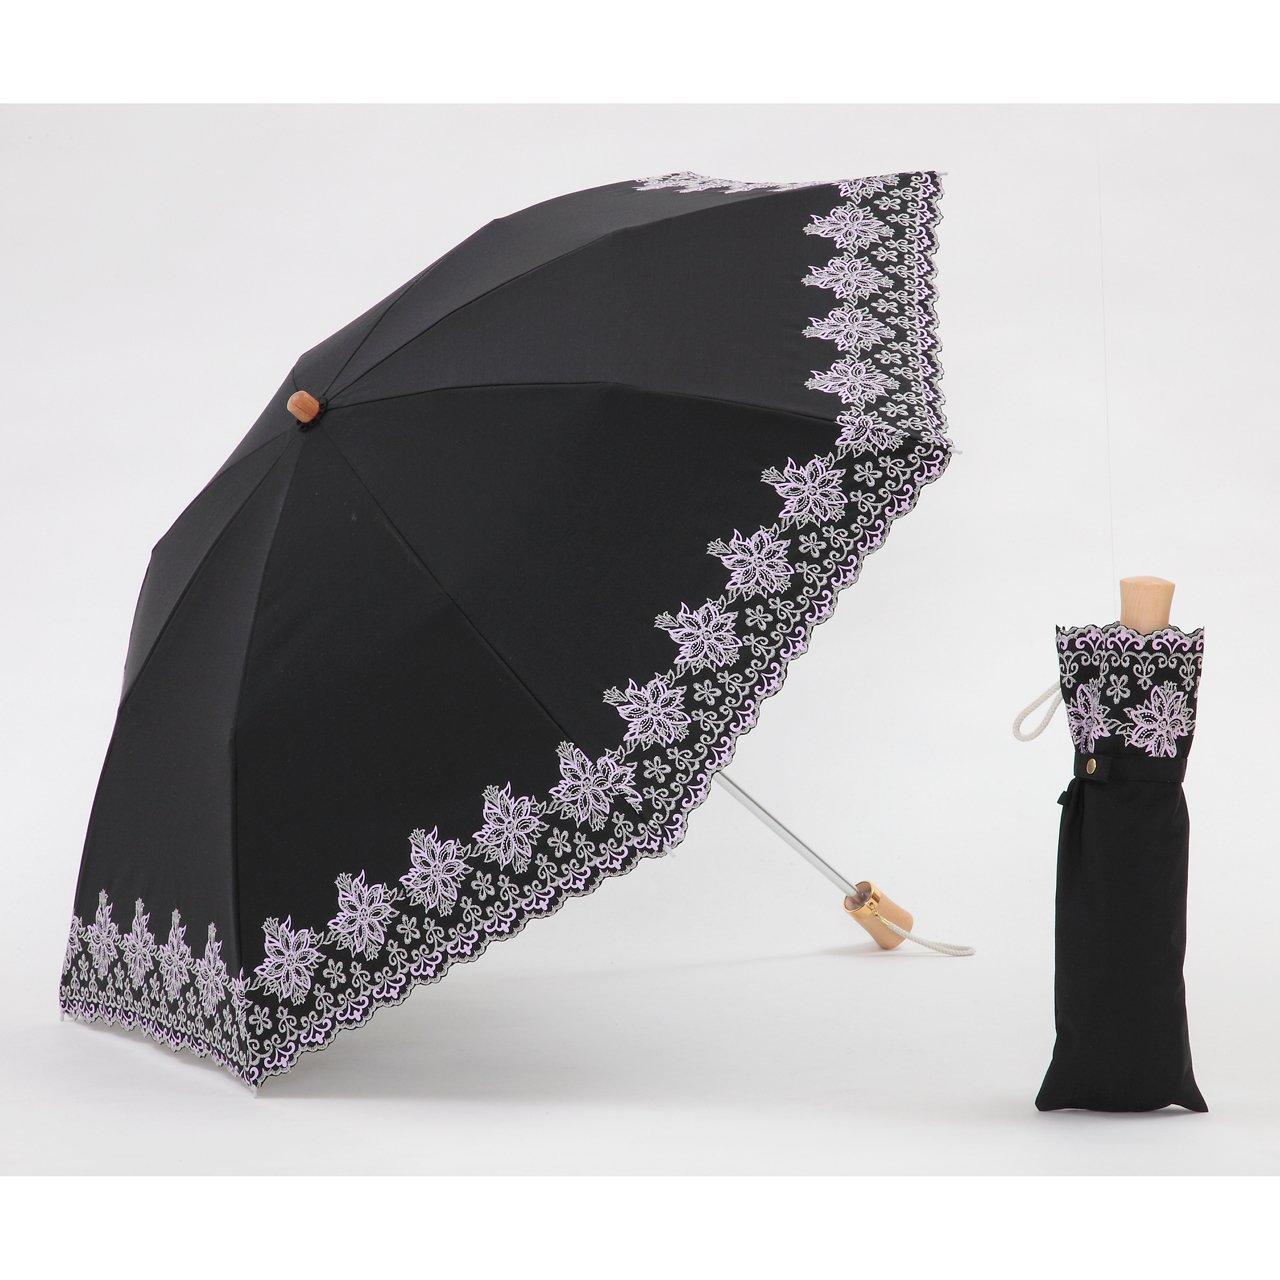 UVカット 晴雨兼用 遮光1級 折りたたみ傘 クールプラス 花柄刺繍(C) ブラック 日傘 【LIEBEN-1512】 B00C38RNH0